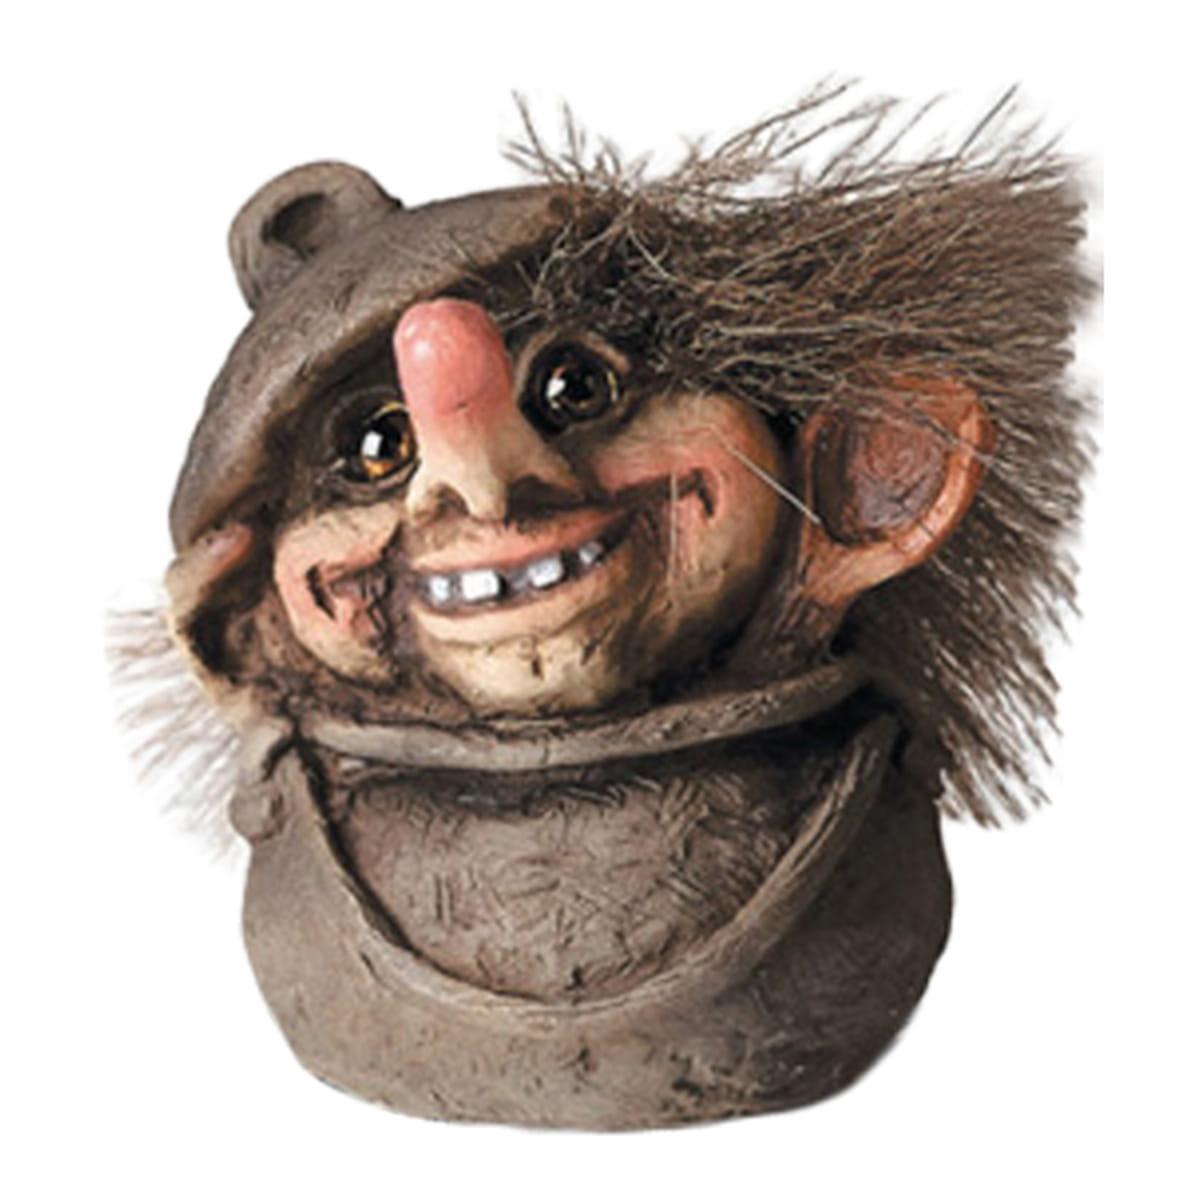 Troll in the black pot (Troll # 054)